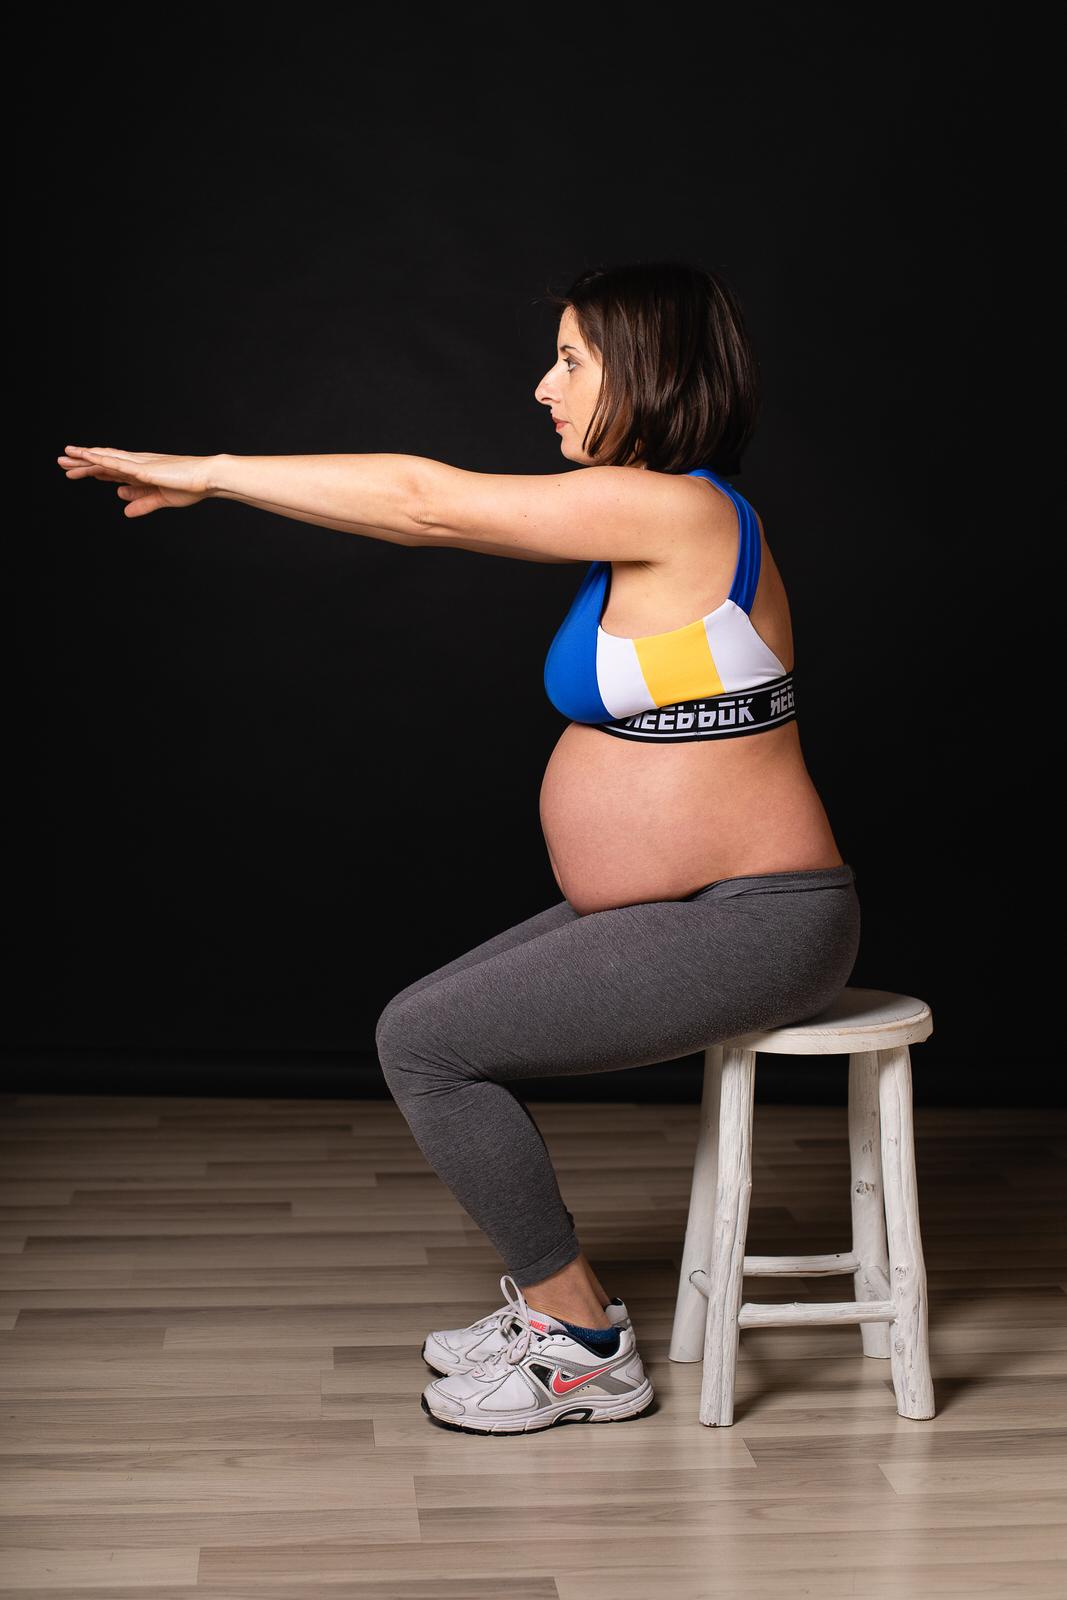 essere-incinta-03